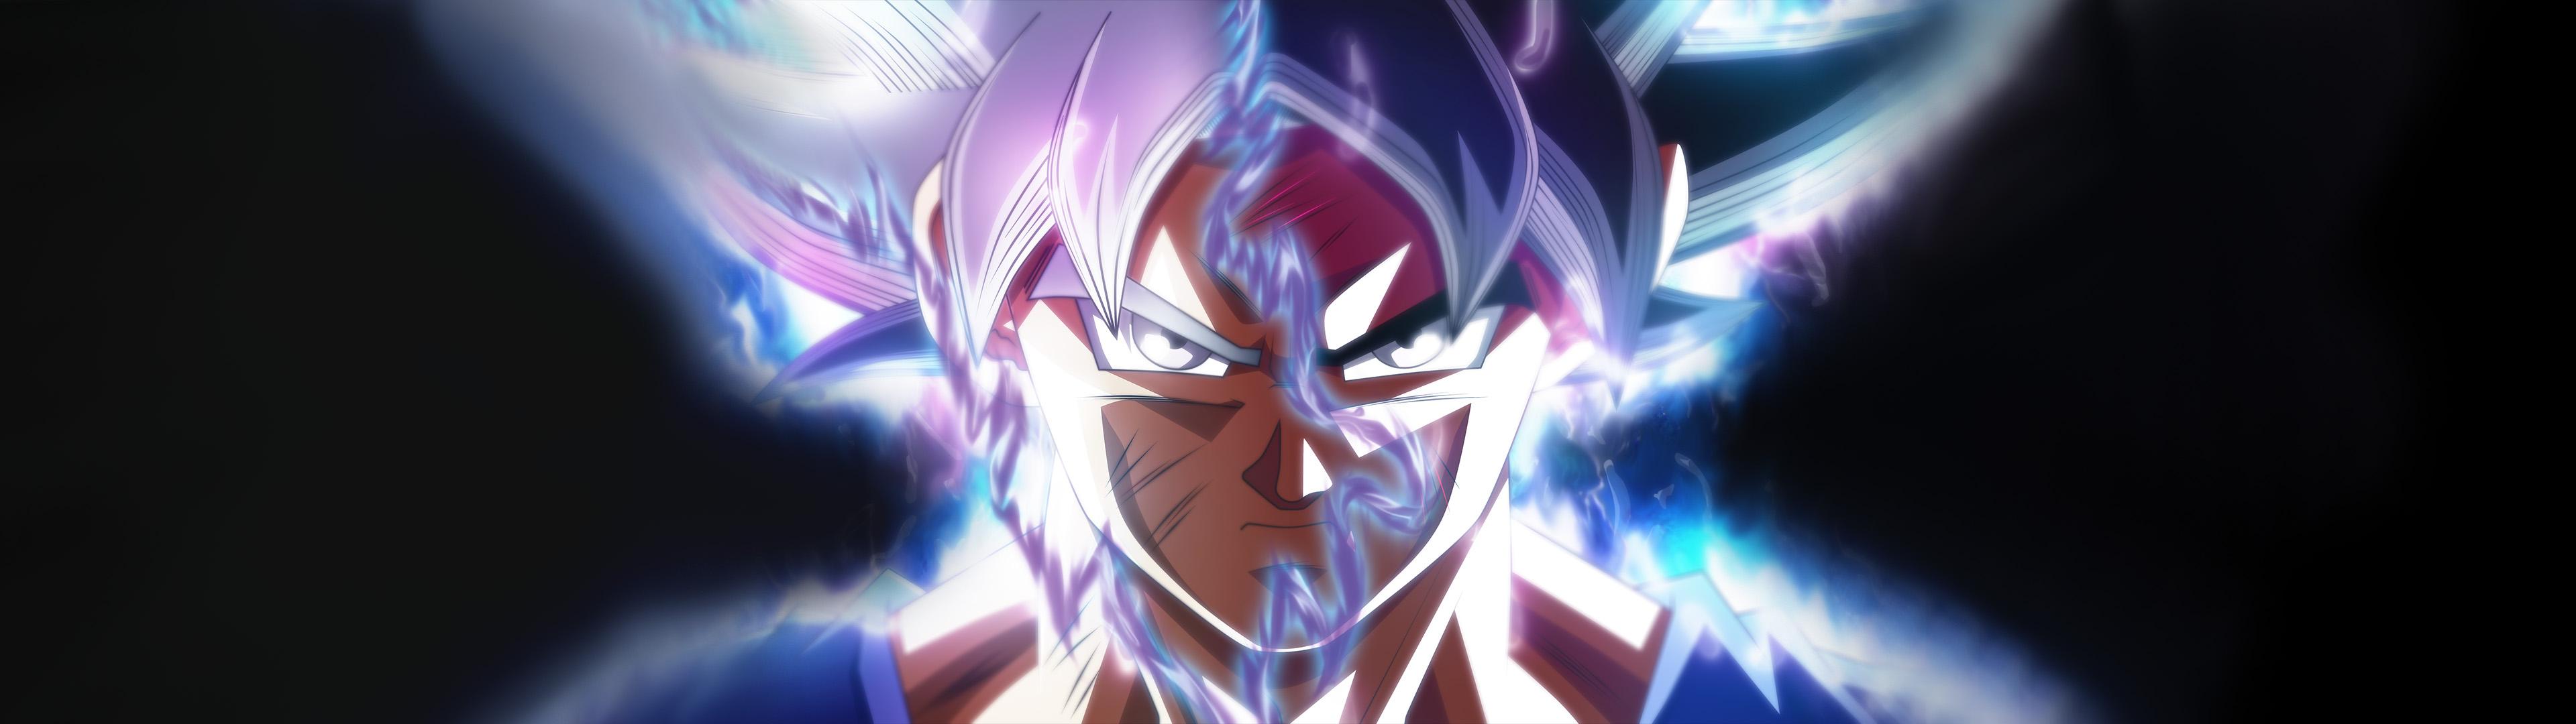 Dragon Ball Son Goku ultra instict 3840 x 1080 multiple display